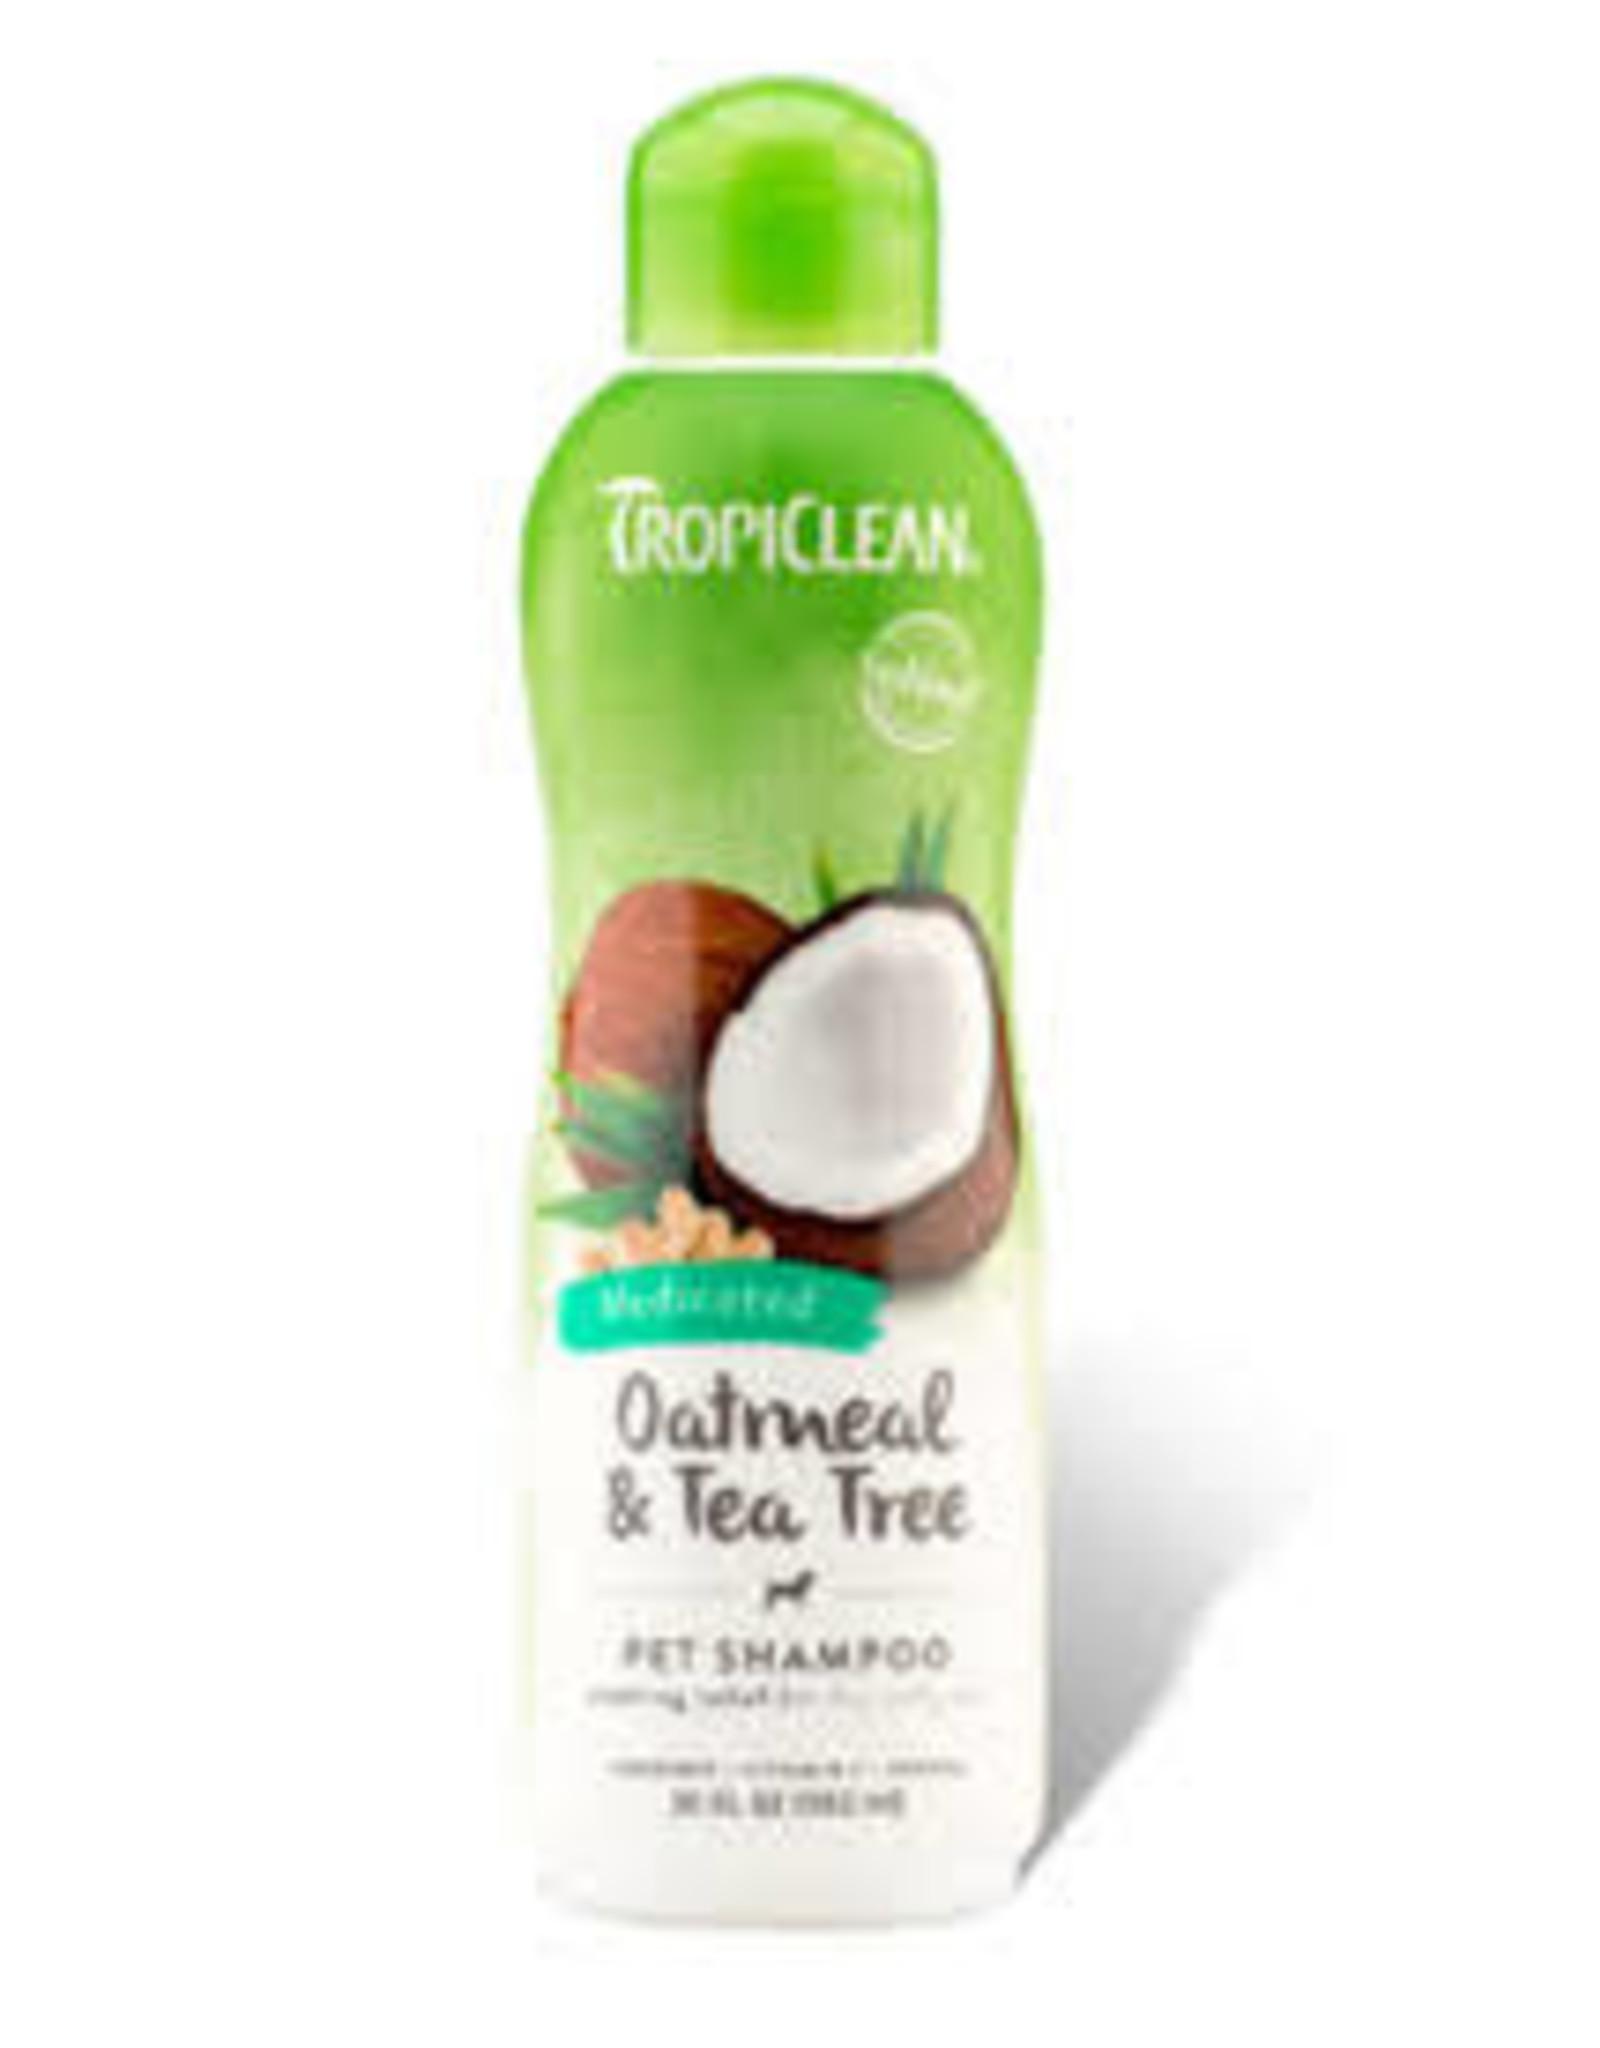 Tropiclean Tropiclean - Oatmeal & Tea Tree Medicated Shampoo